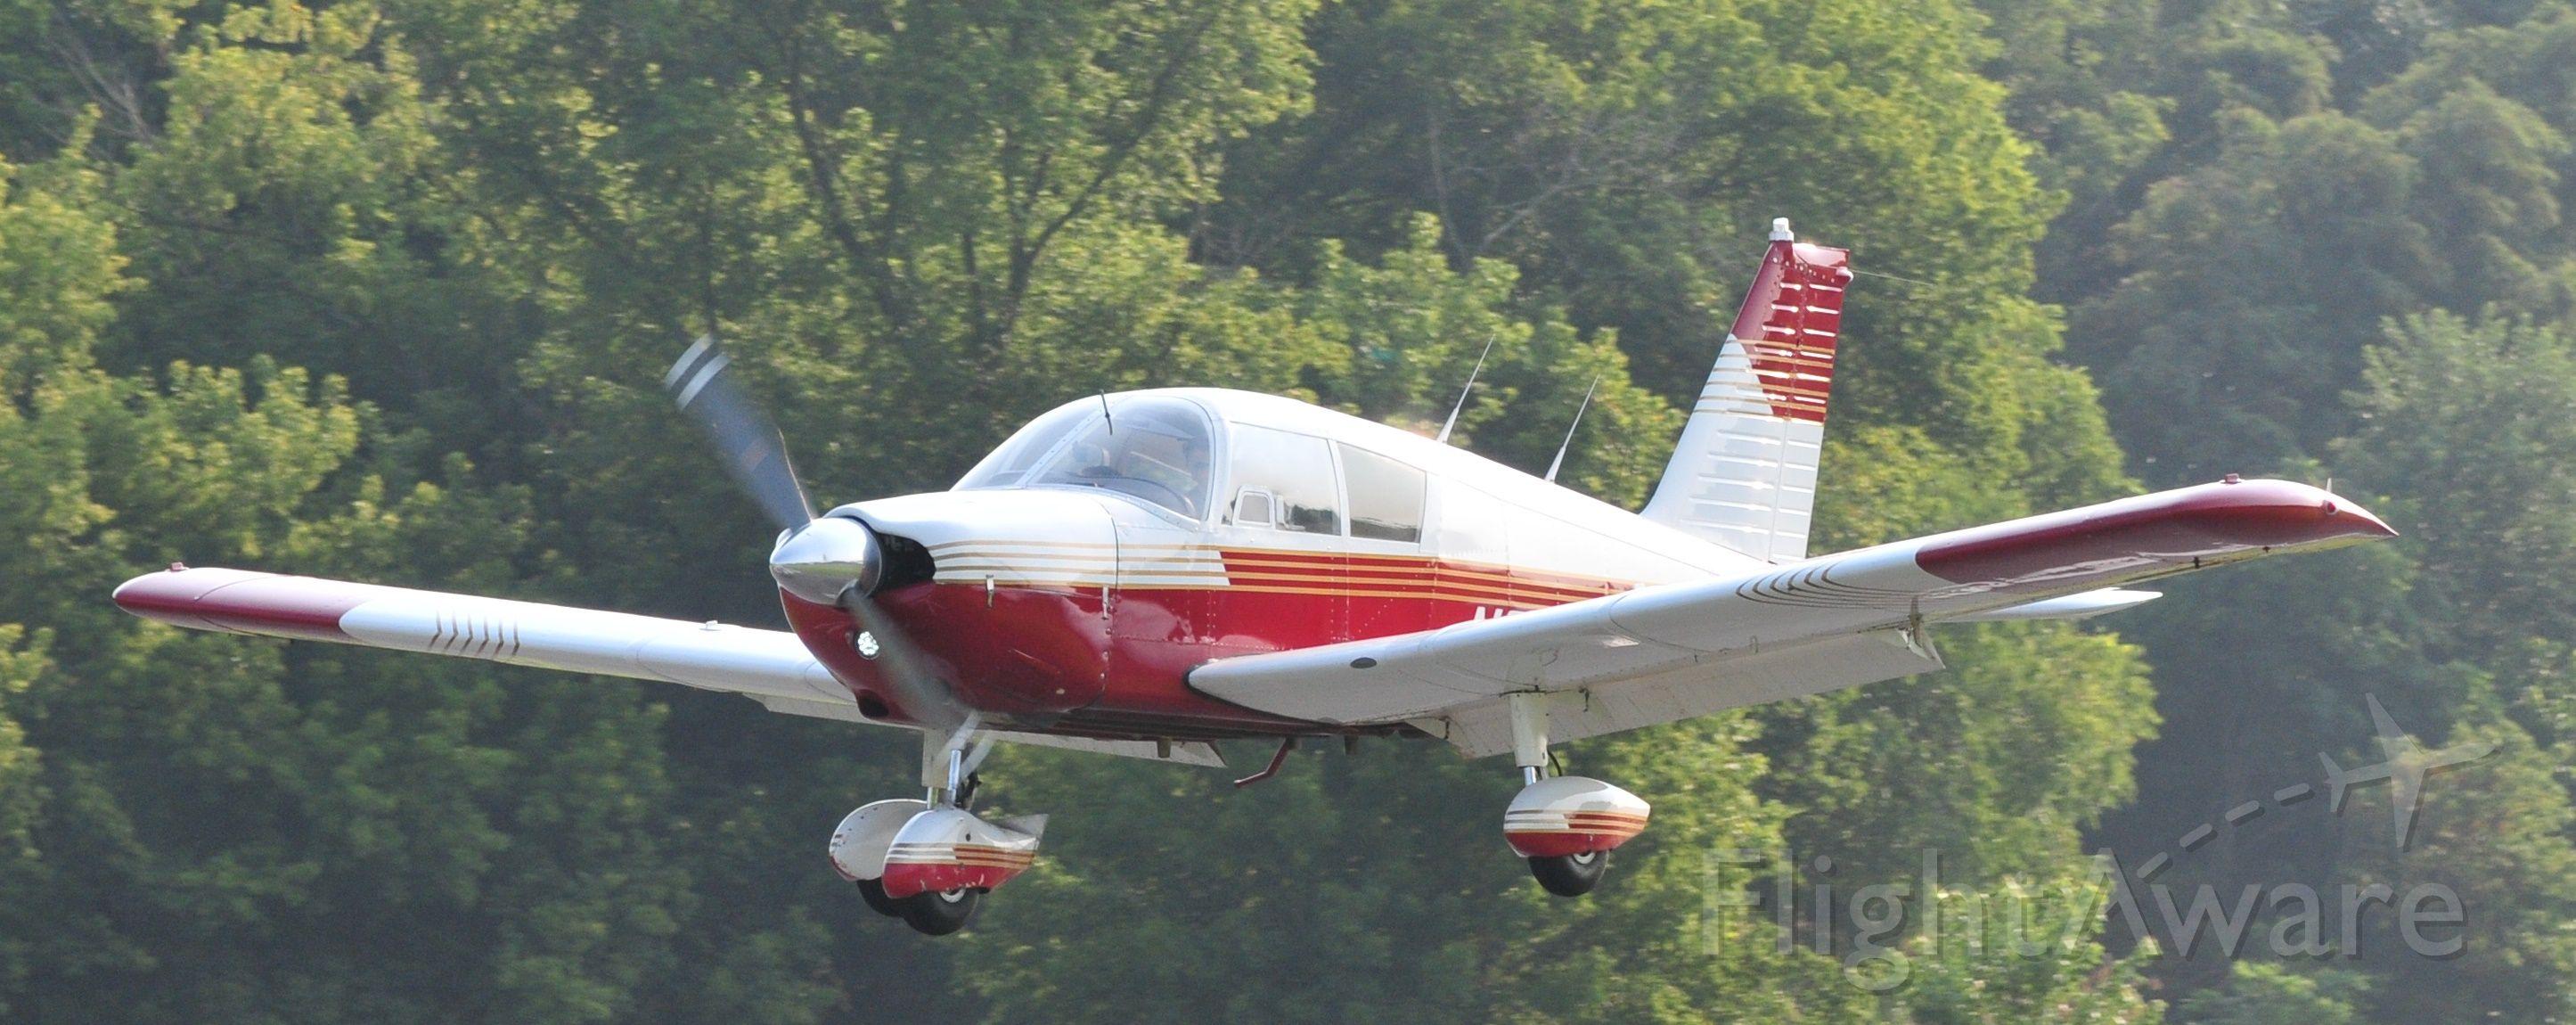 Piper Dakota / Pathfinder (N235MA)